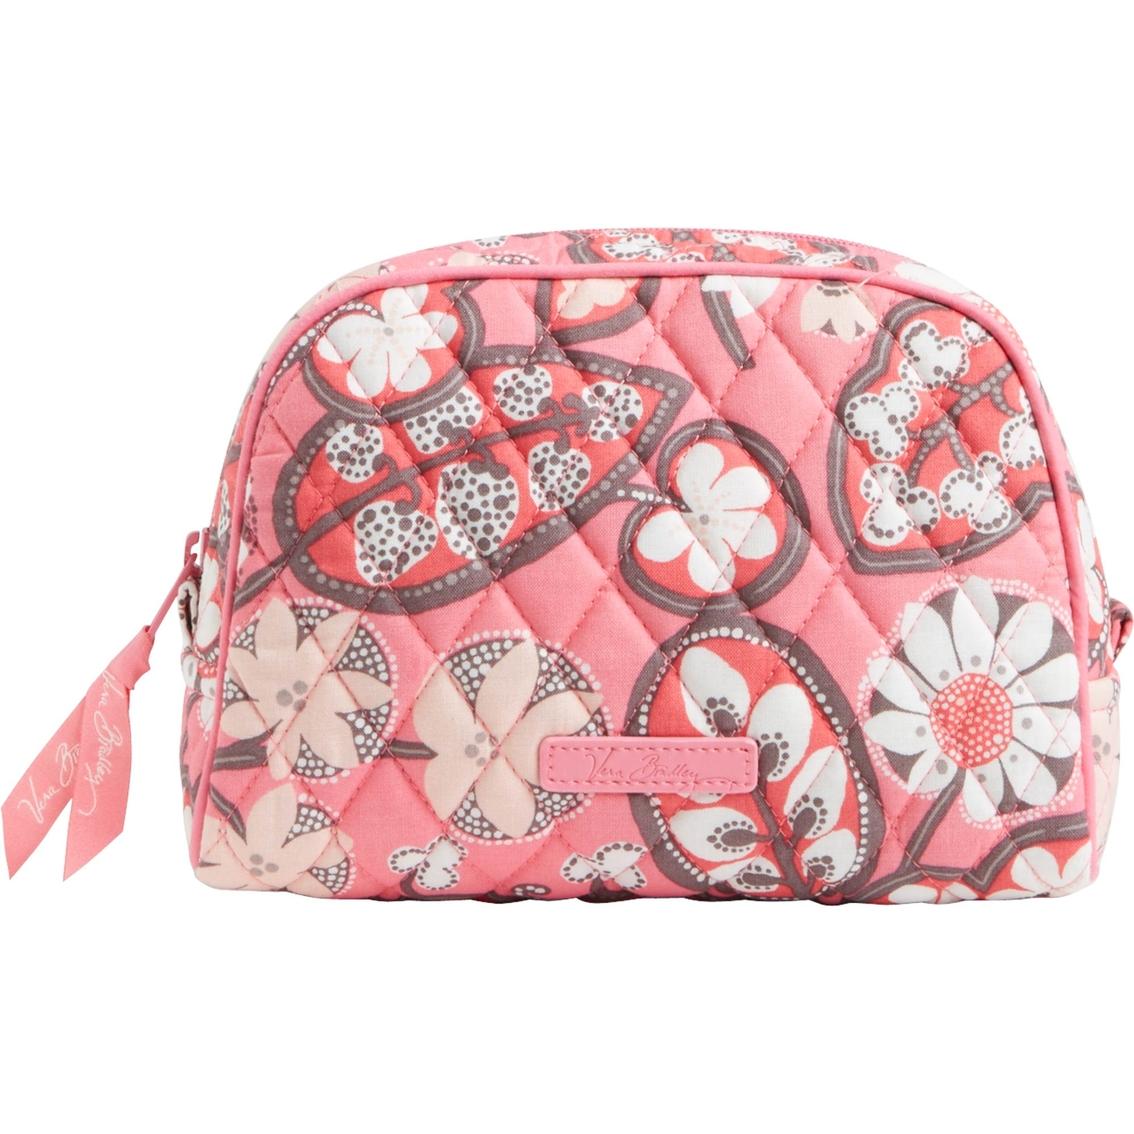 Vera Bradley Medium Zip Cosmetic Bag, Blush Pink